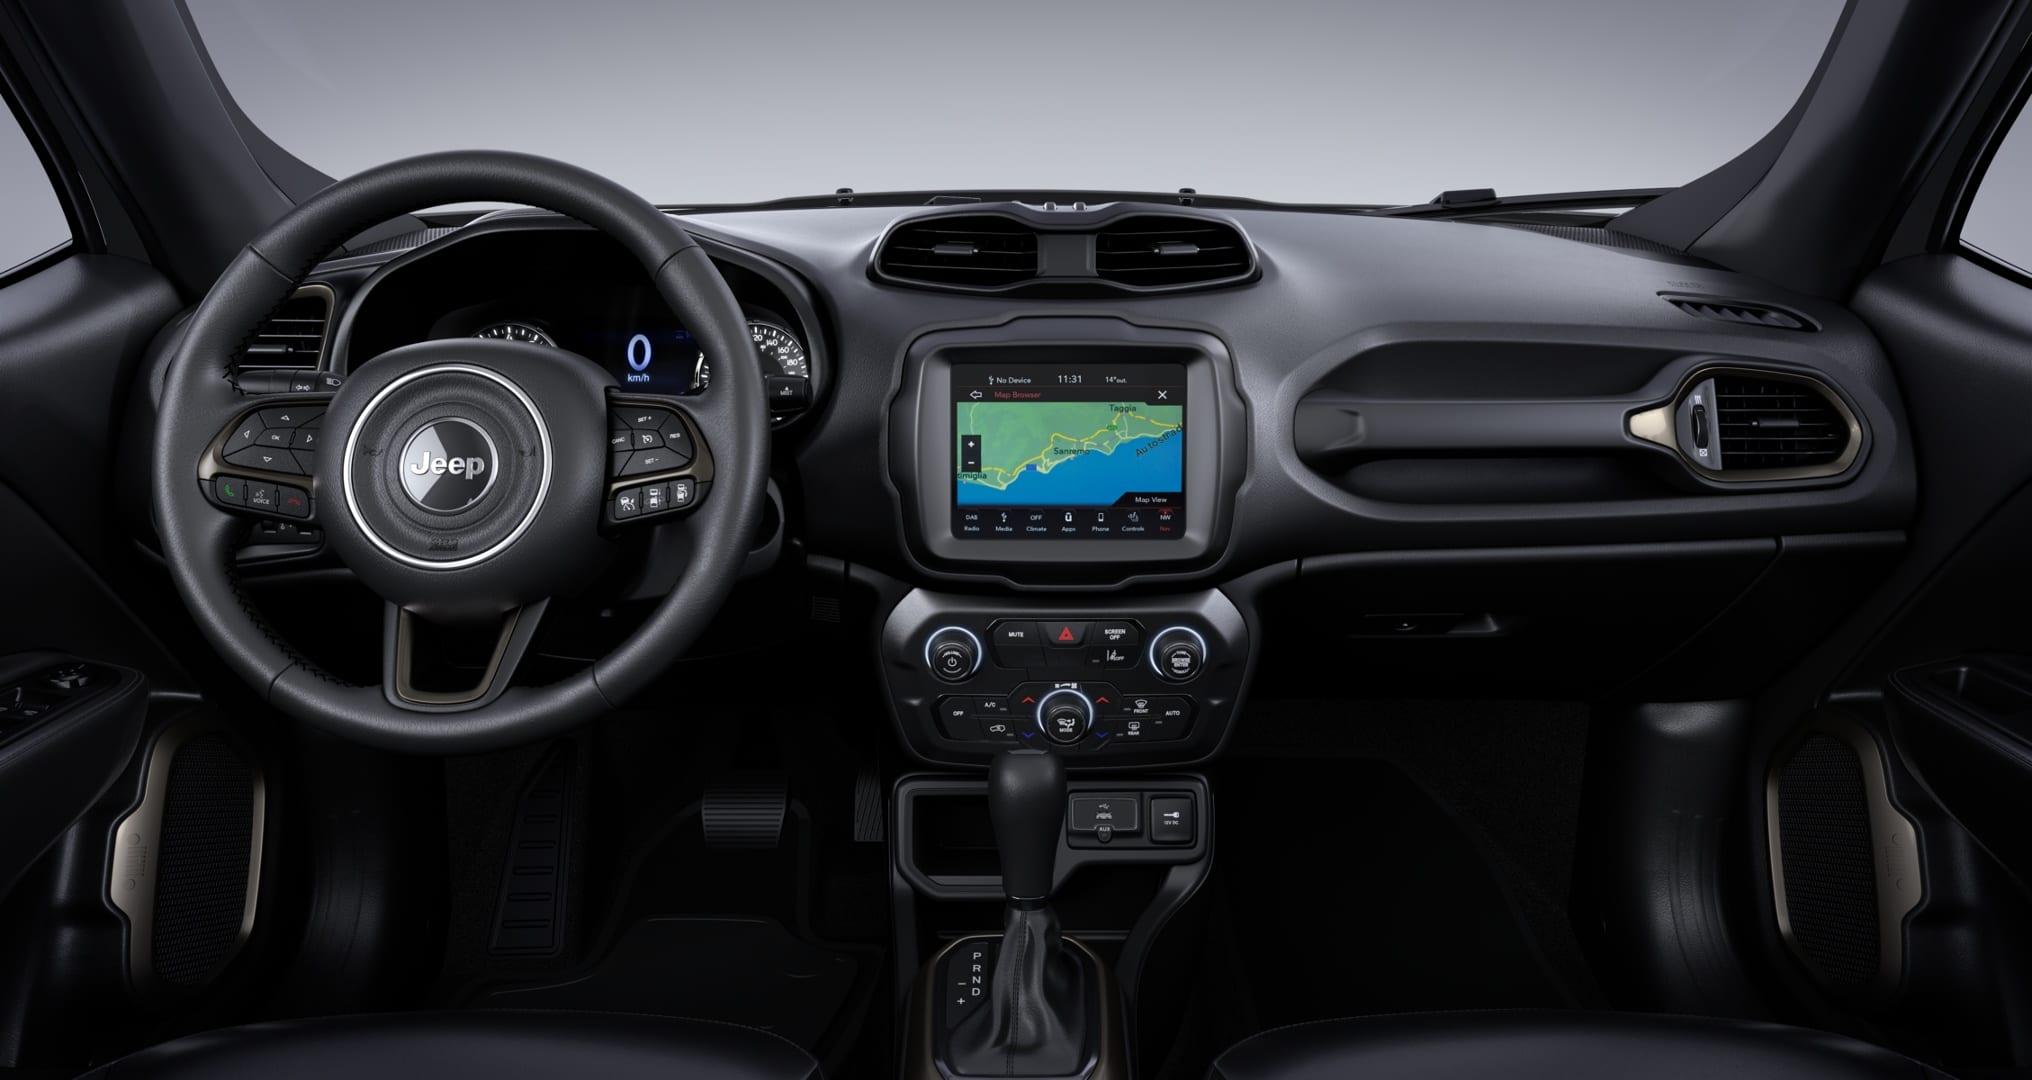 Jeep Renegade S Sting Grey - dashboard